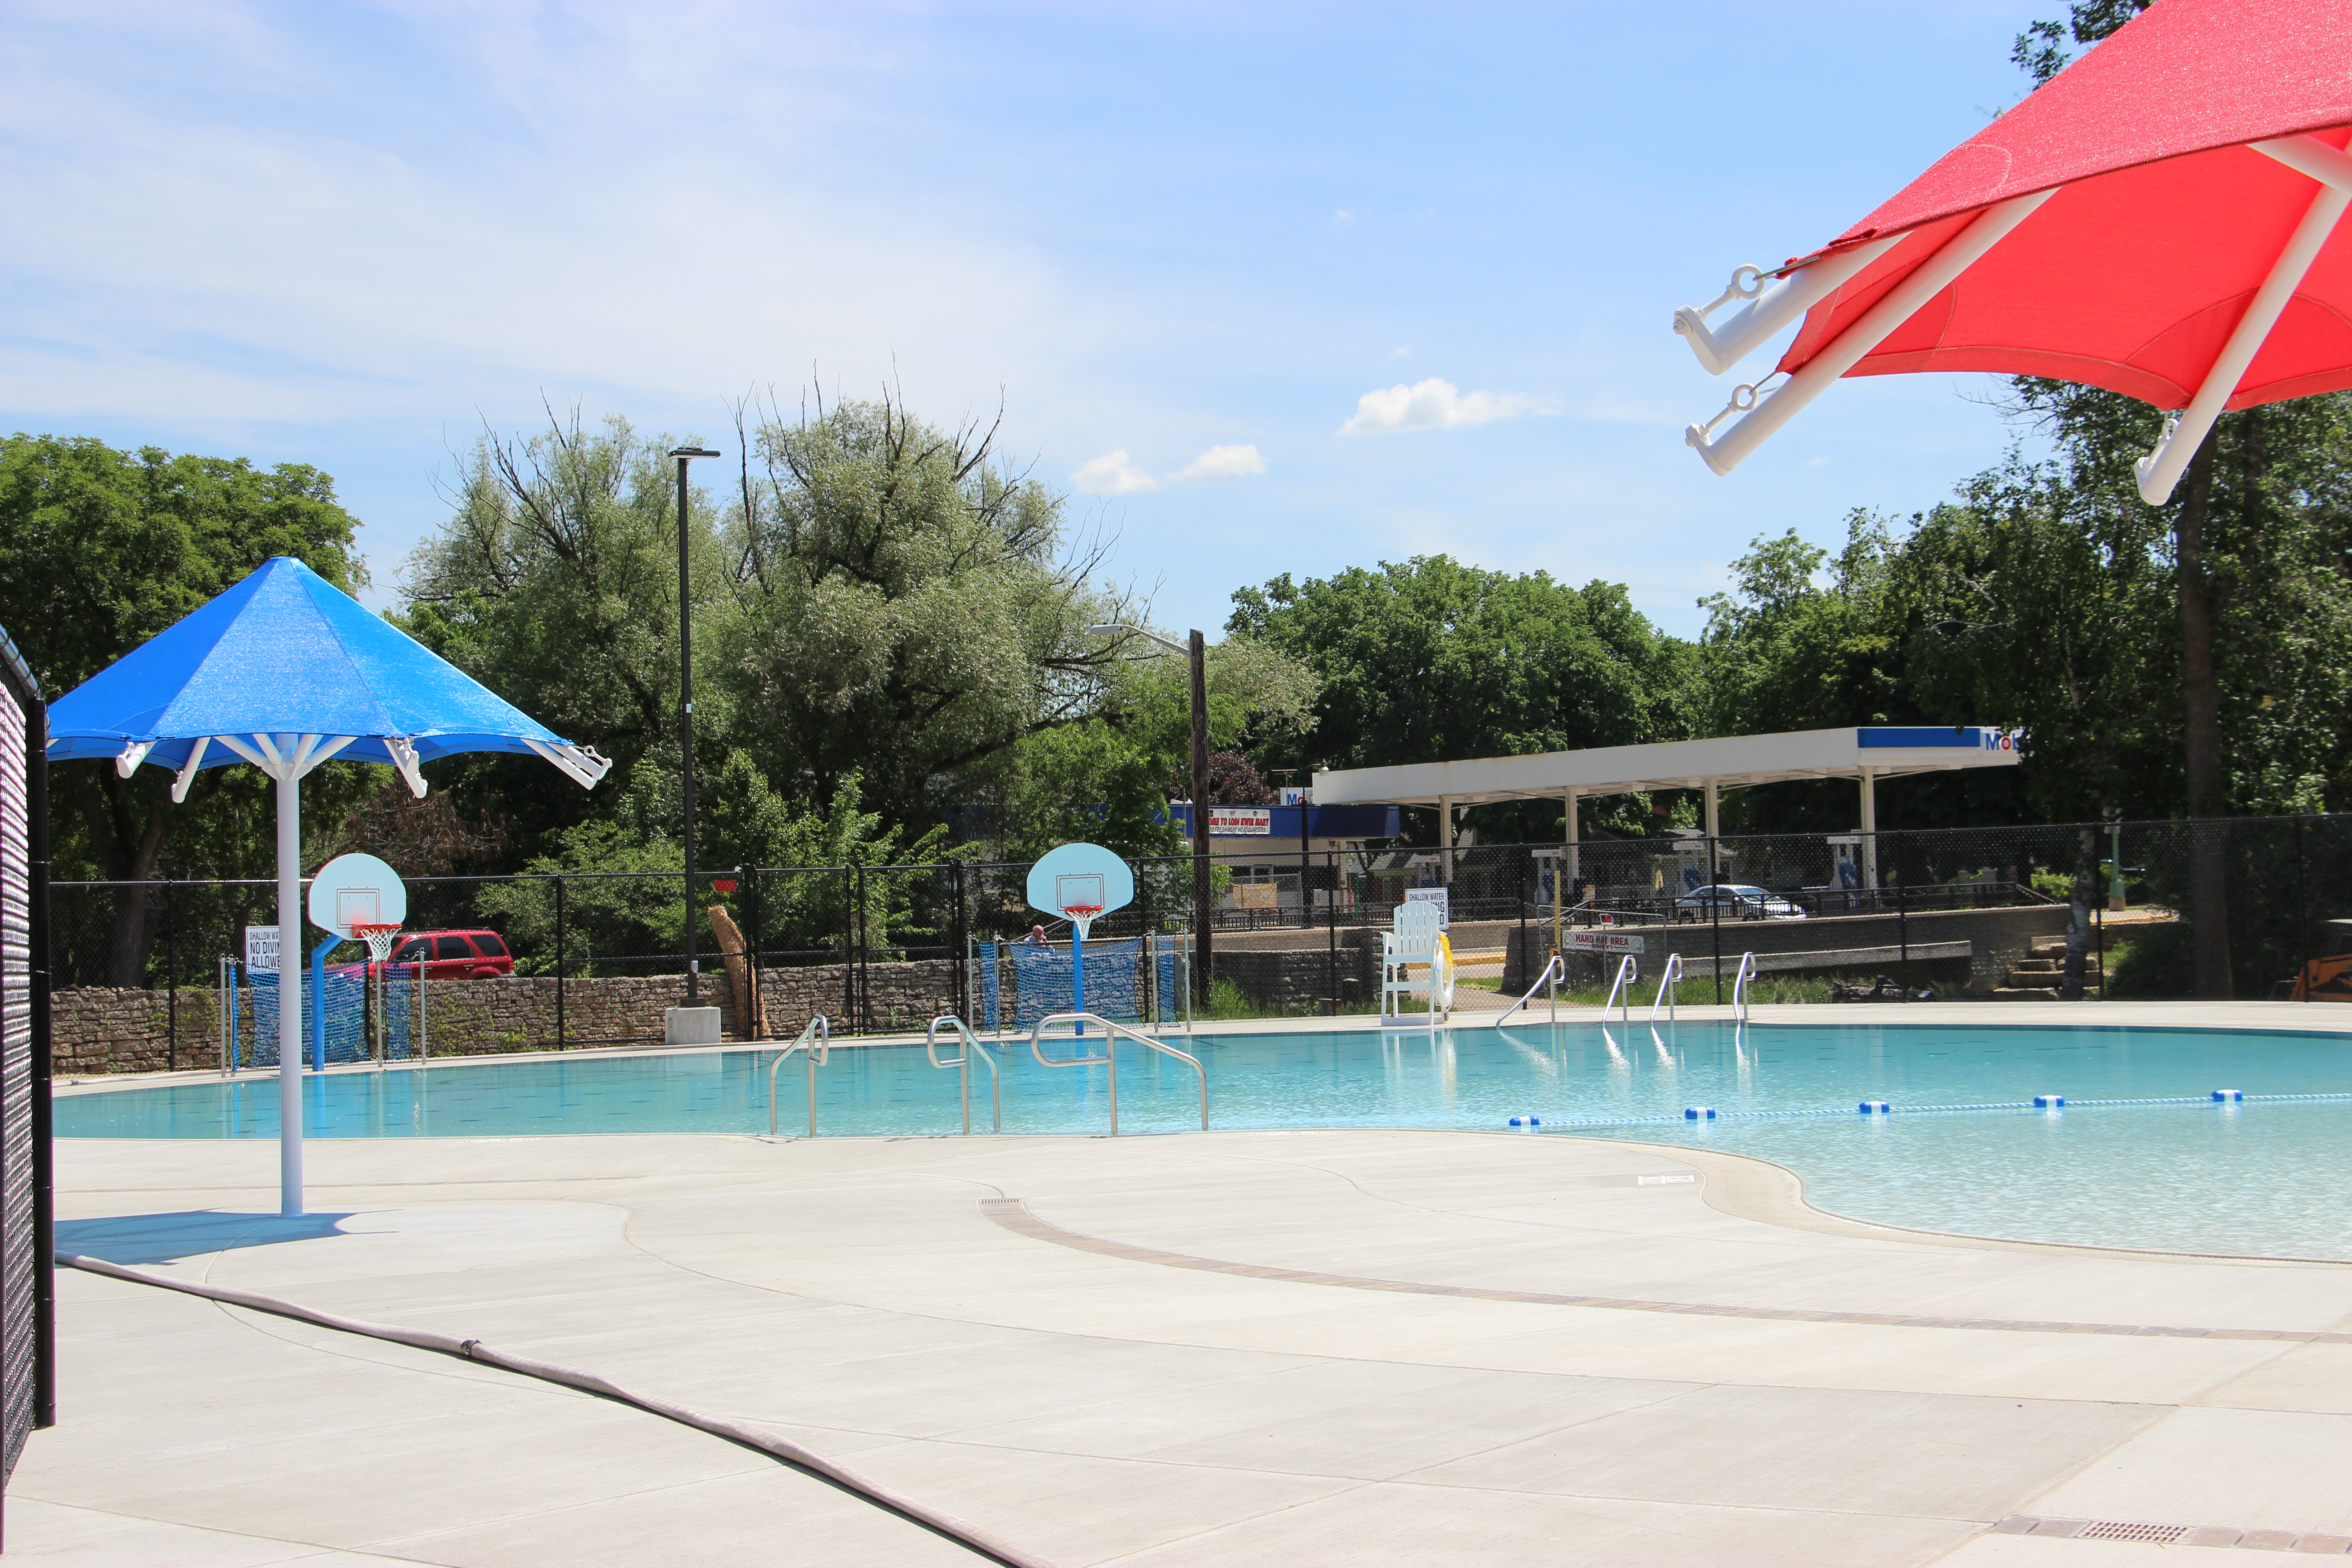 City of Lodi public pool opening